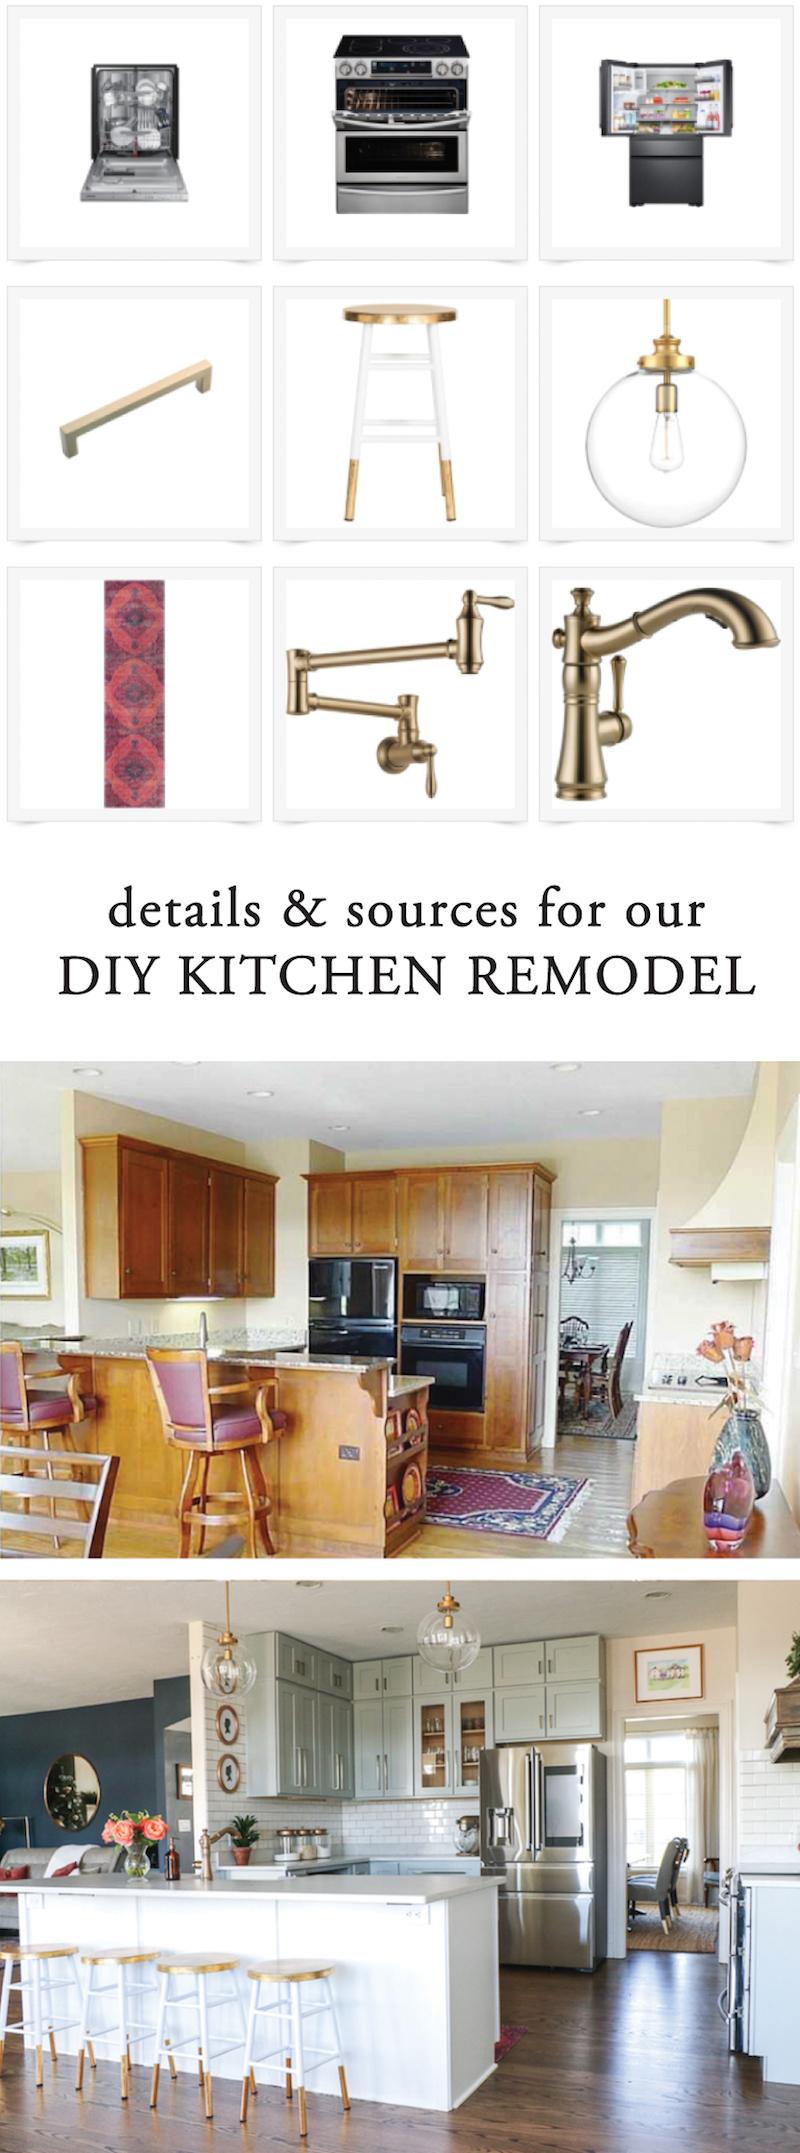 Details of our DIY Kitchen Remodel | Sincerely, Sara D.